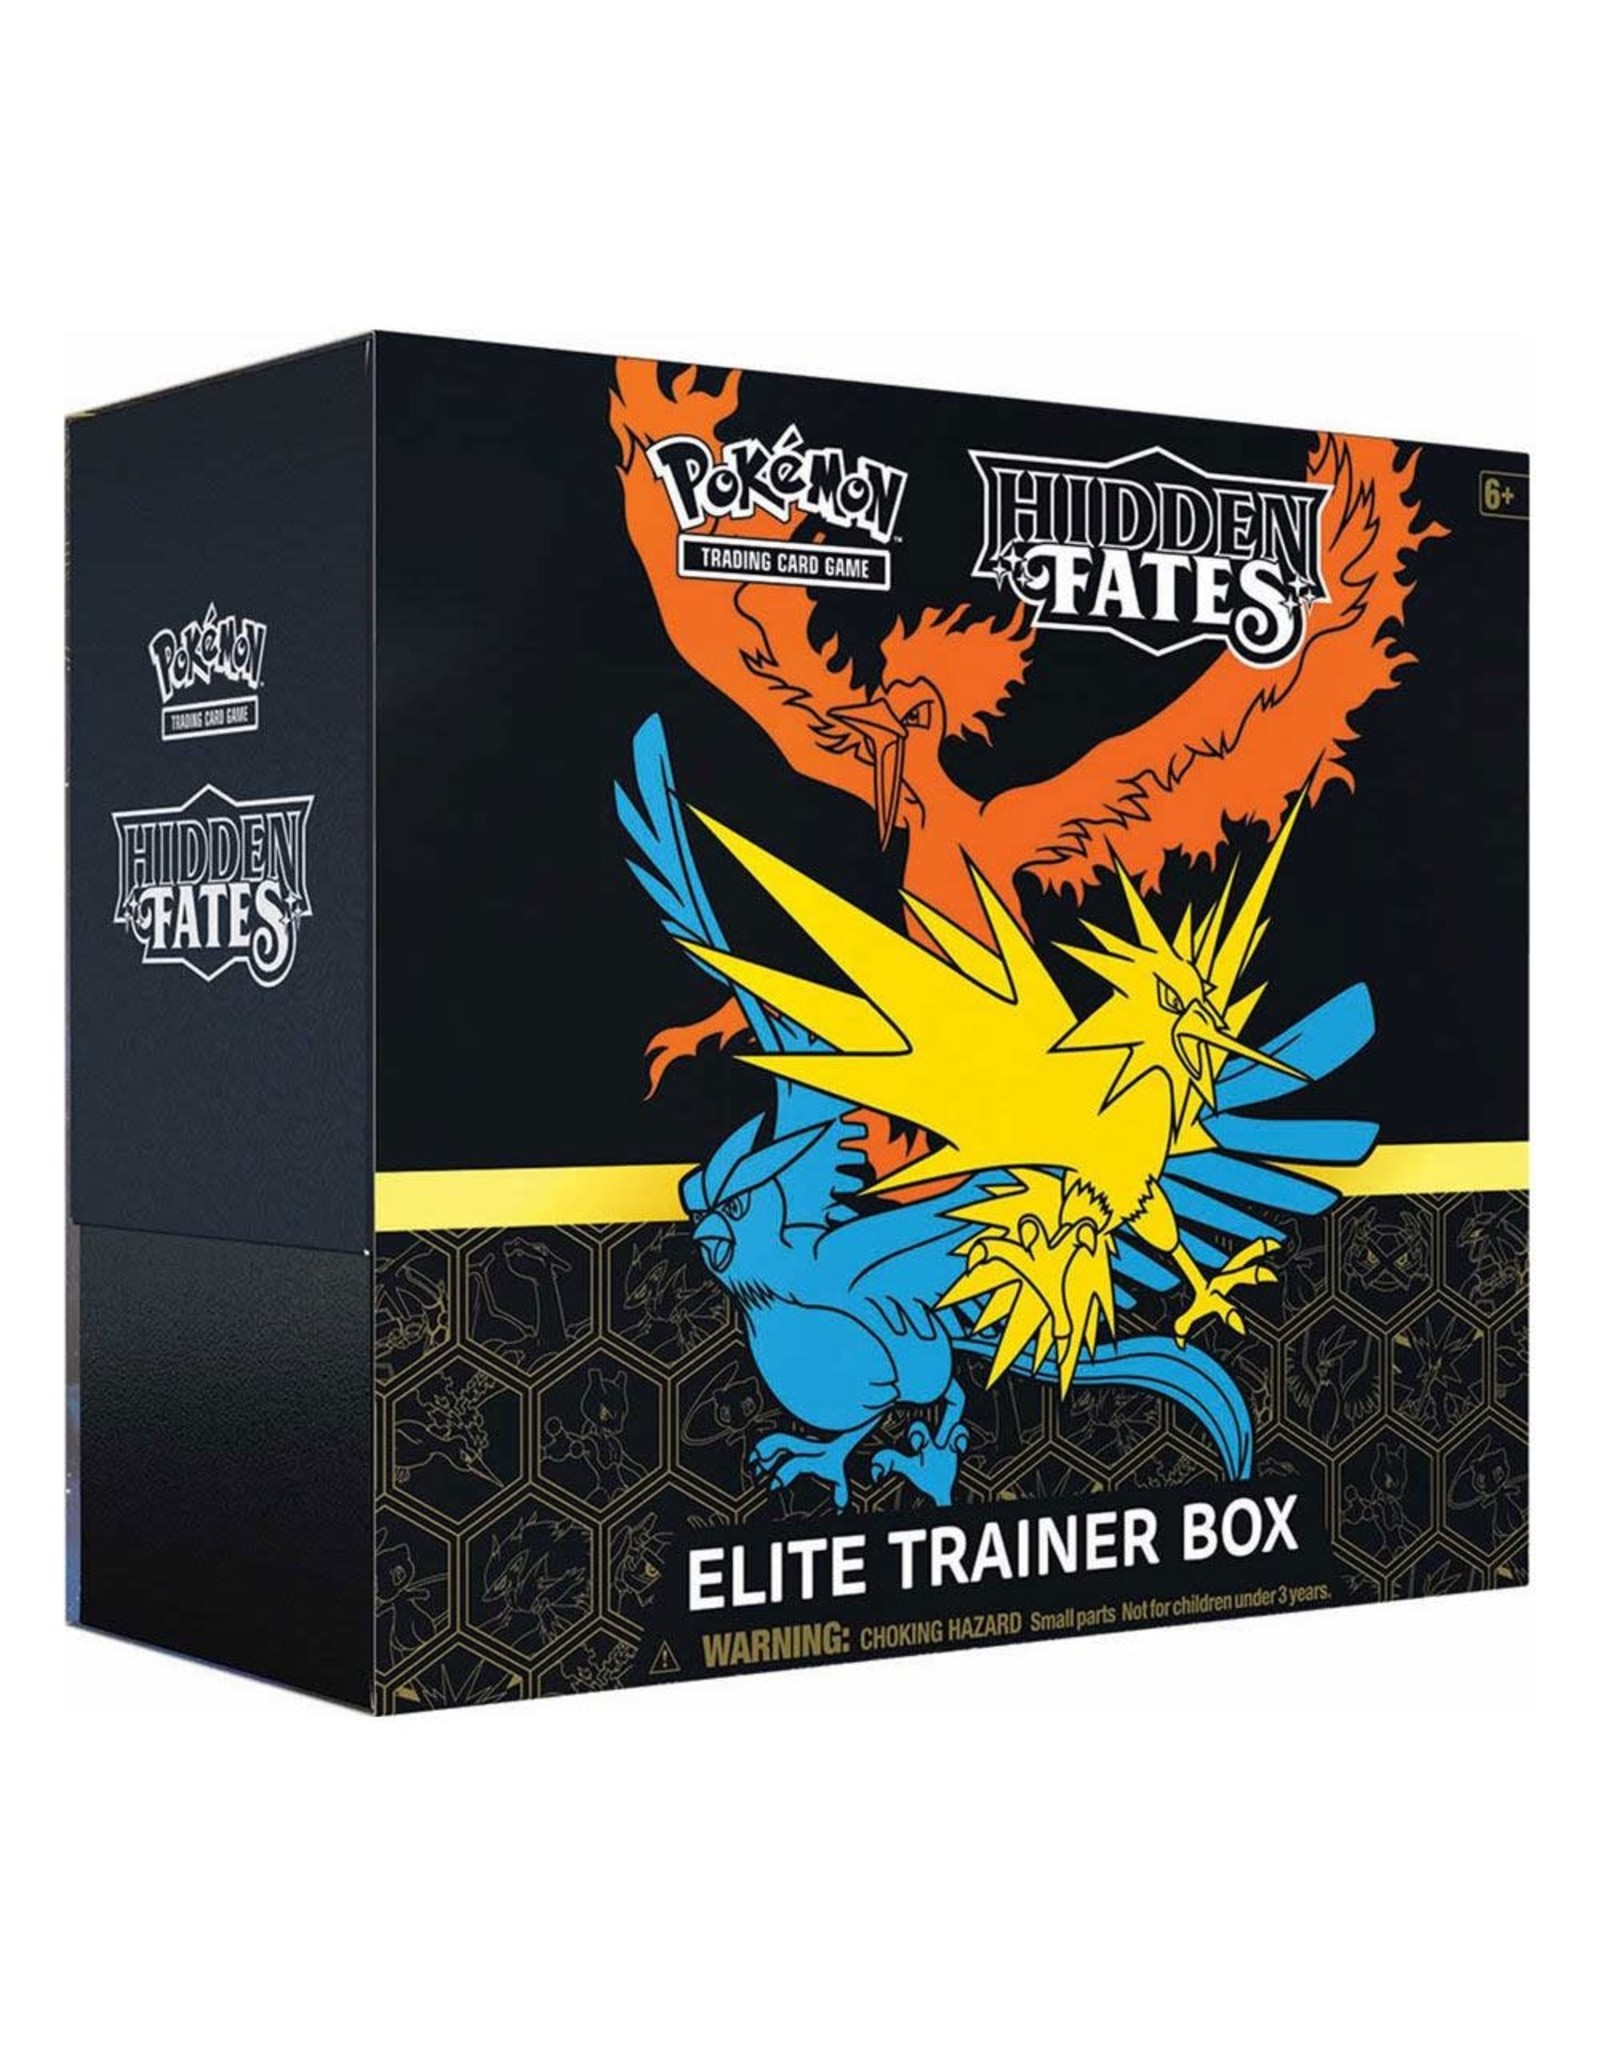 Pokemon Trading Card Game - Hidden Fates Elite Trainer Box